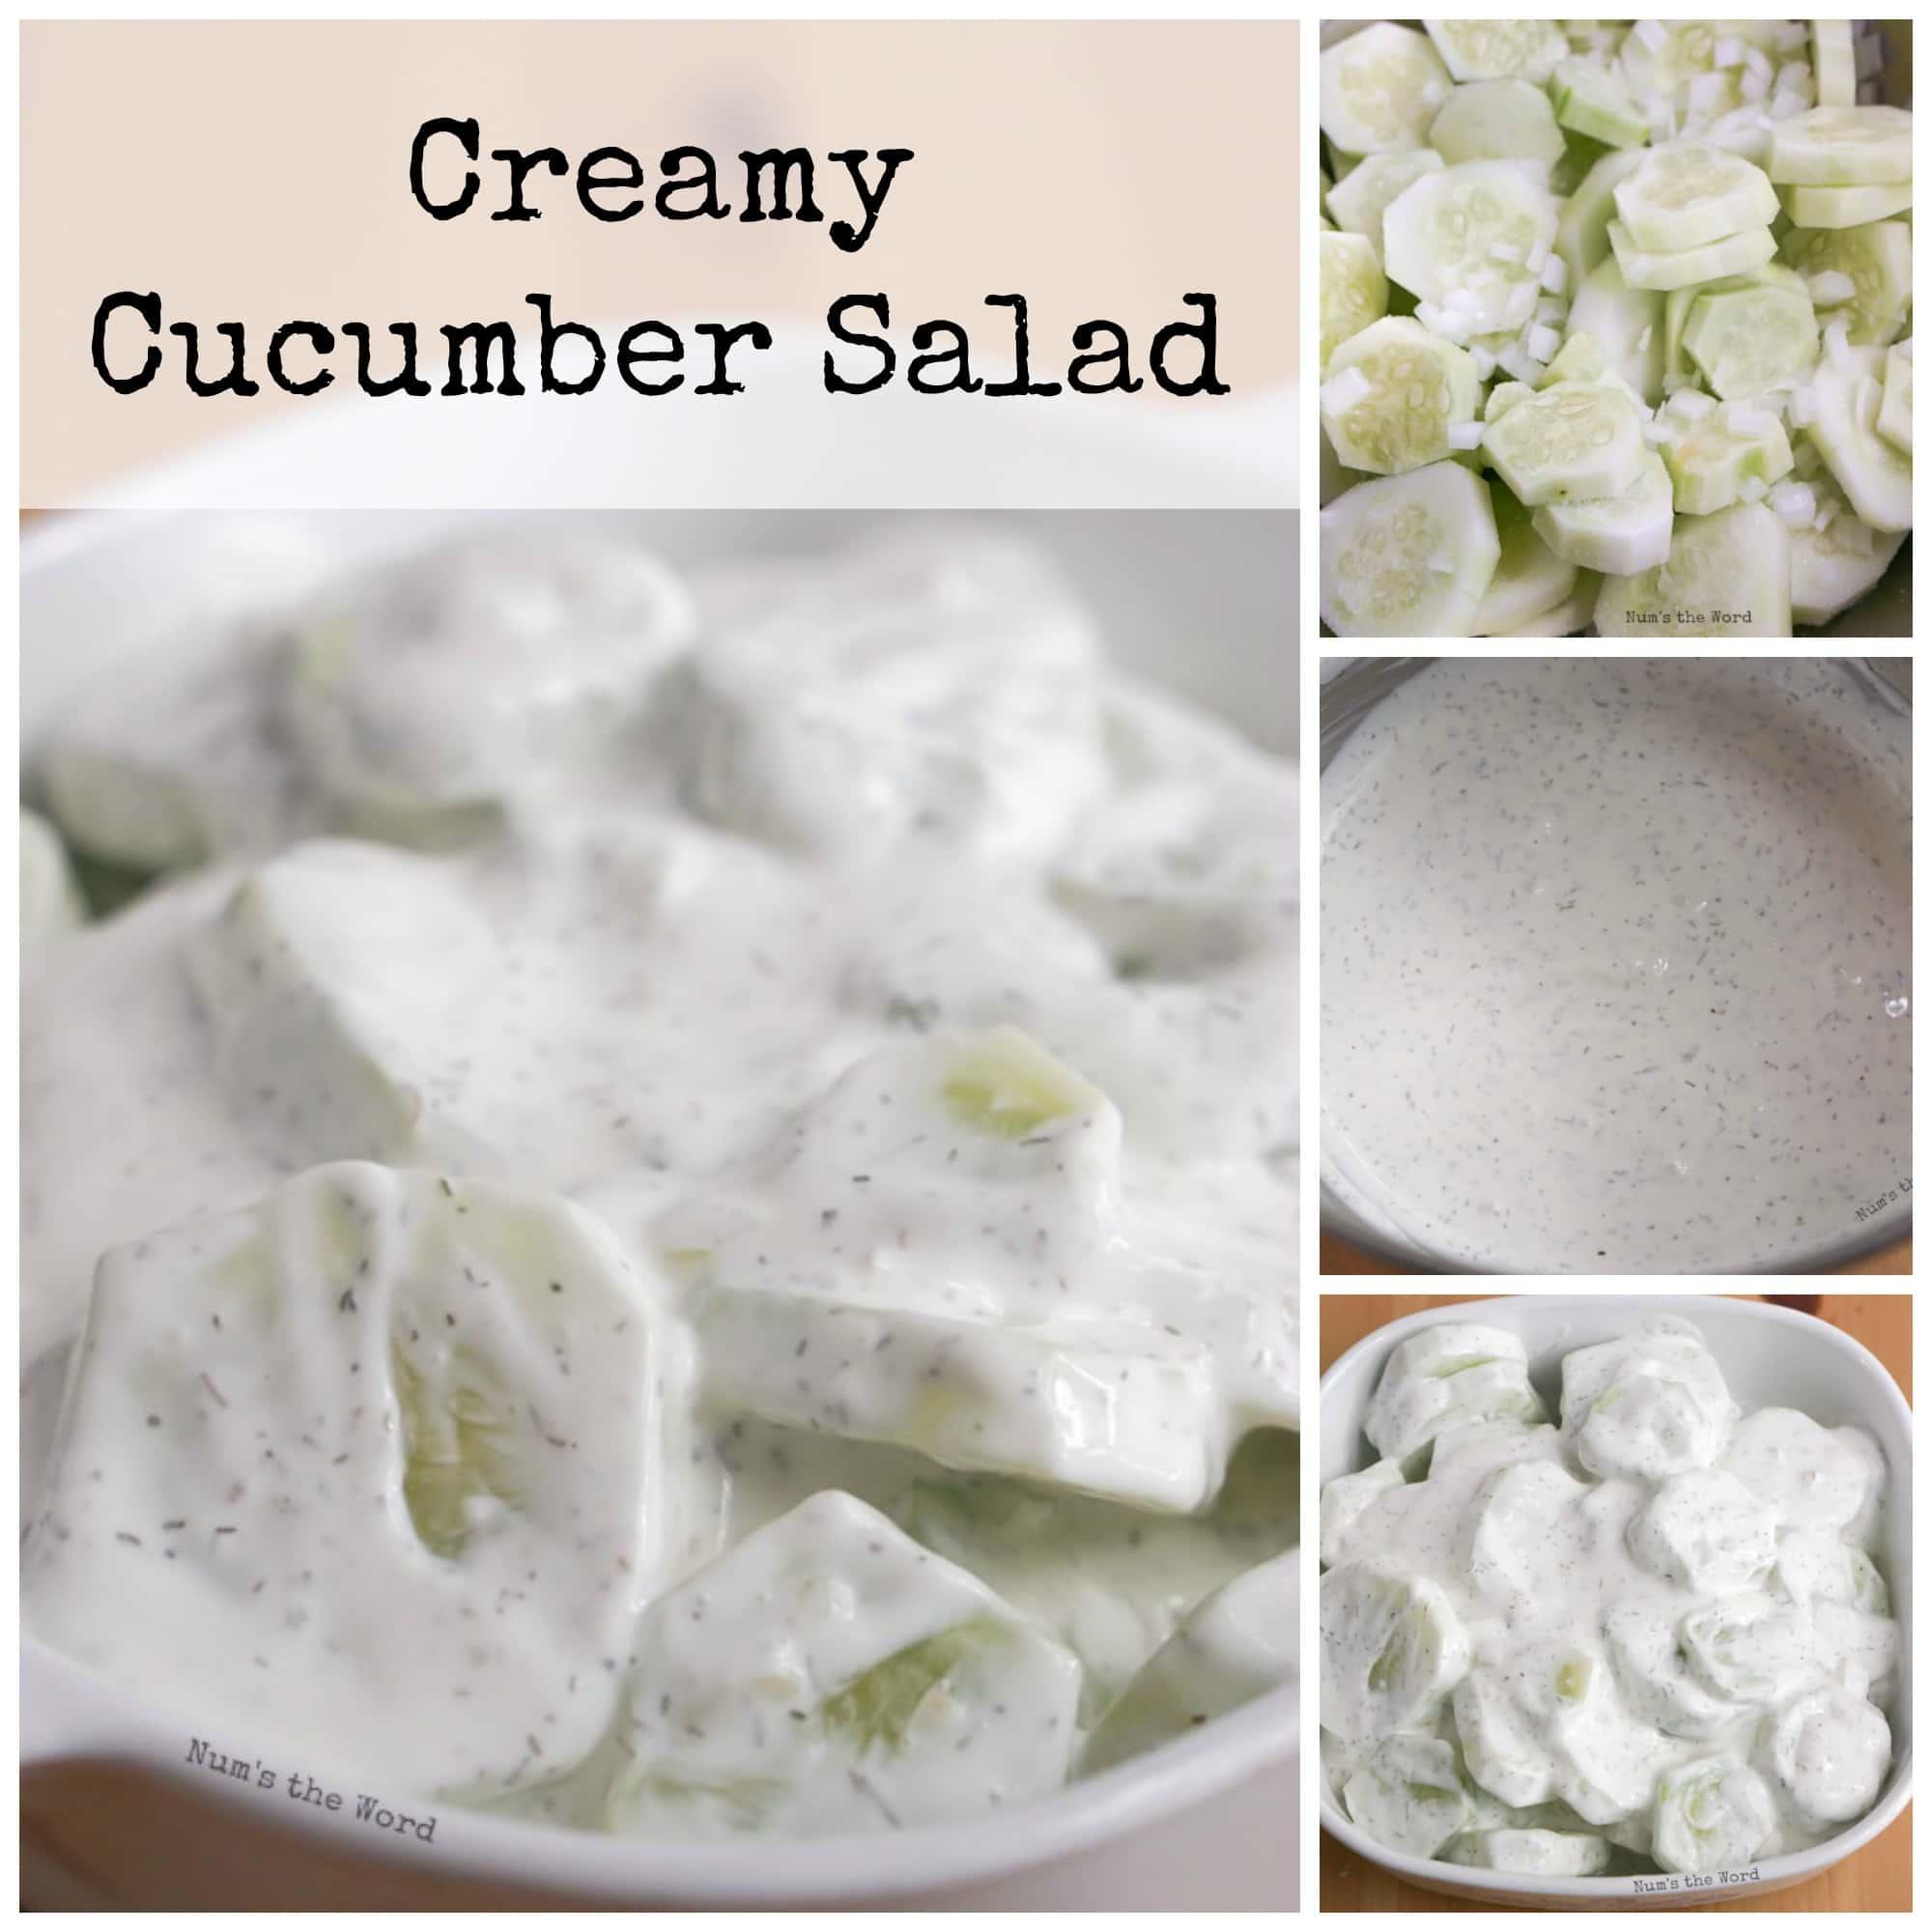 Creamy Cucumber Salad - Num's the Word